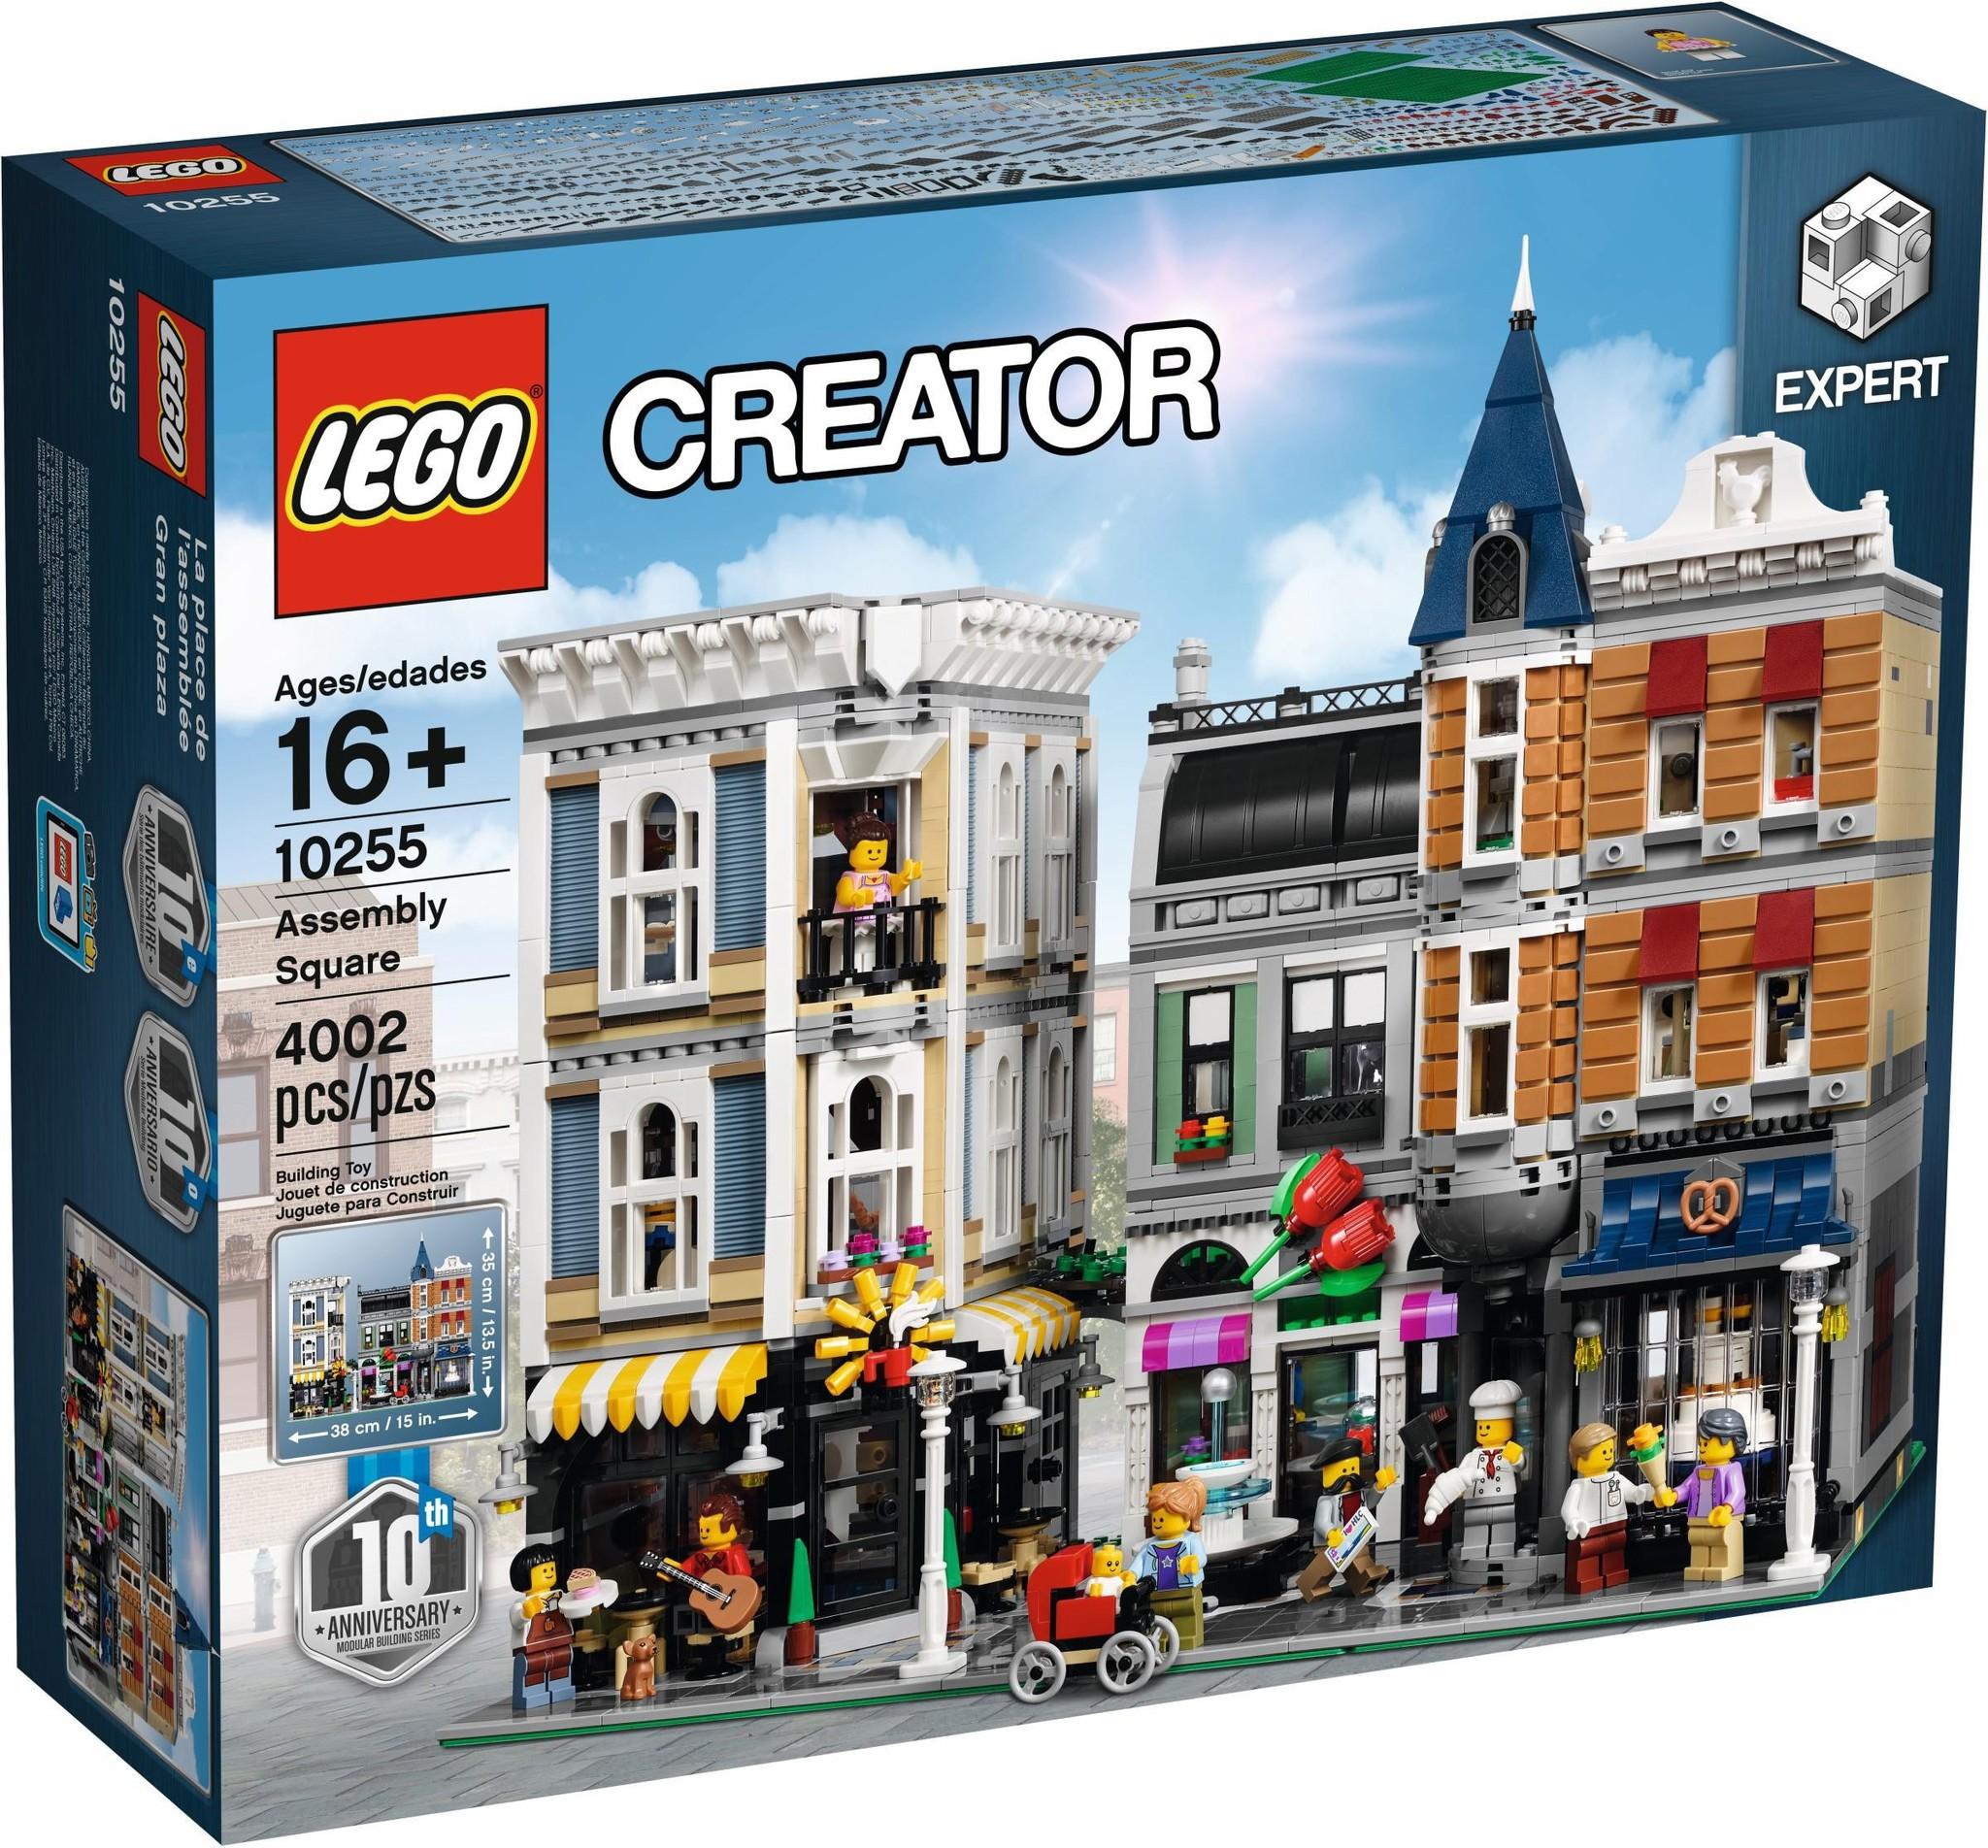 Lego LEGO CREATOR Assembly Square 10255